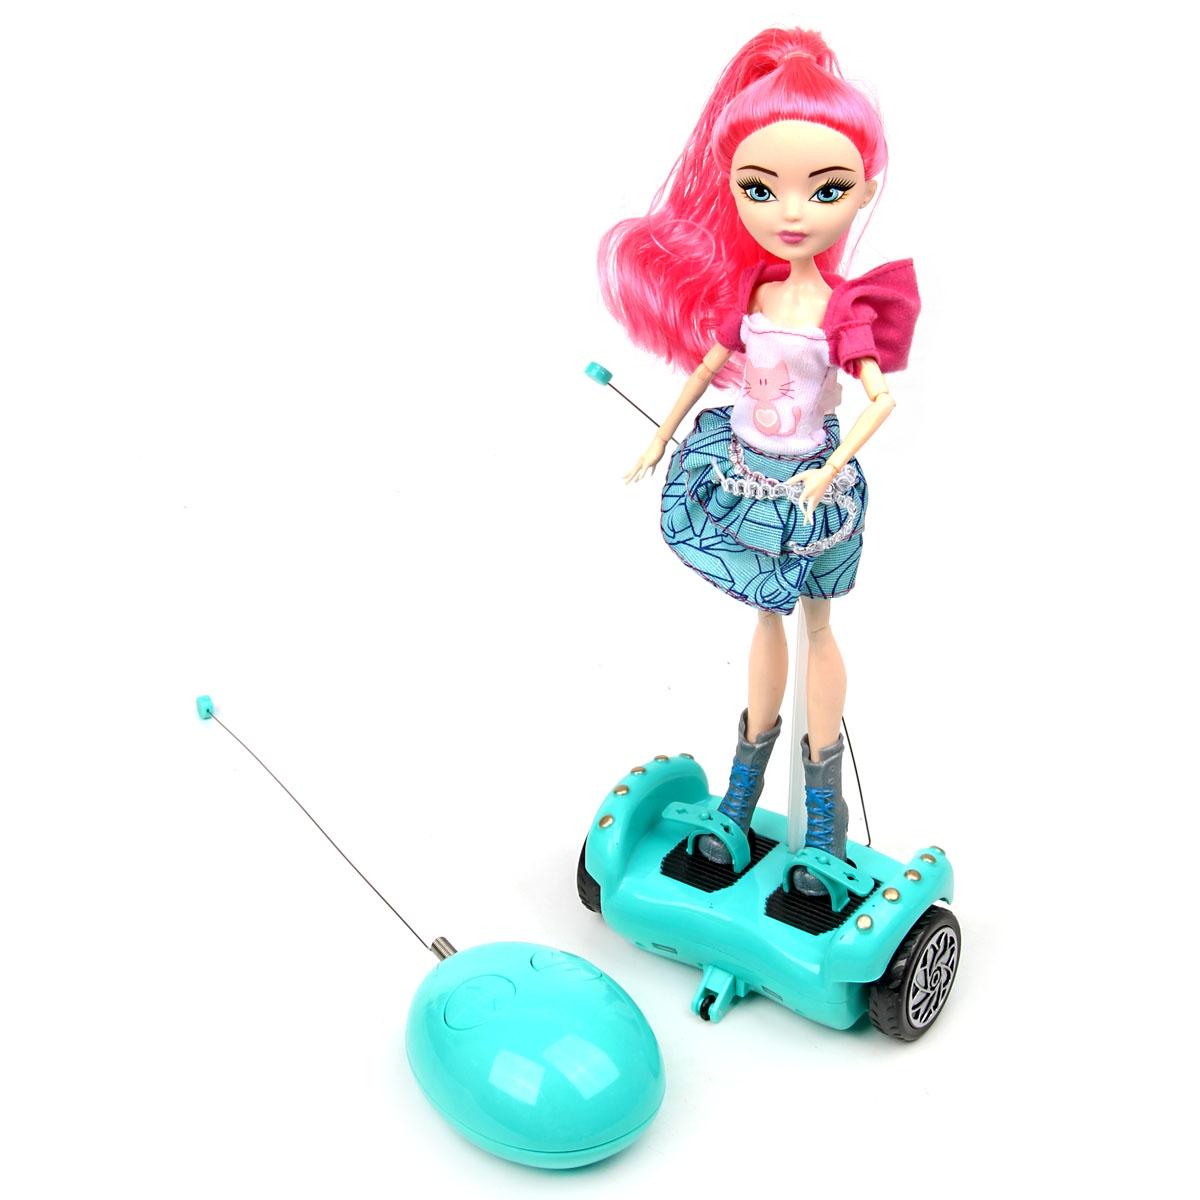 Кукла, 35 см. на гироскутере veld co кукла цвет одежды бежевый розовый